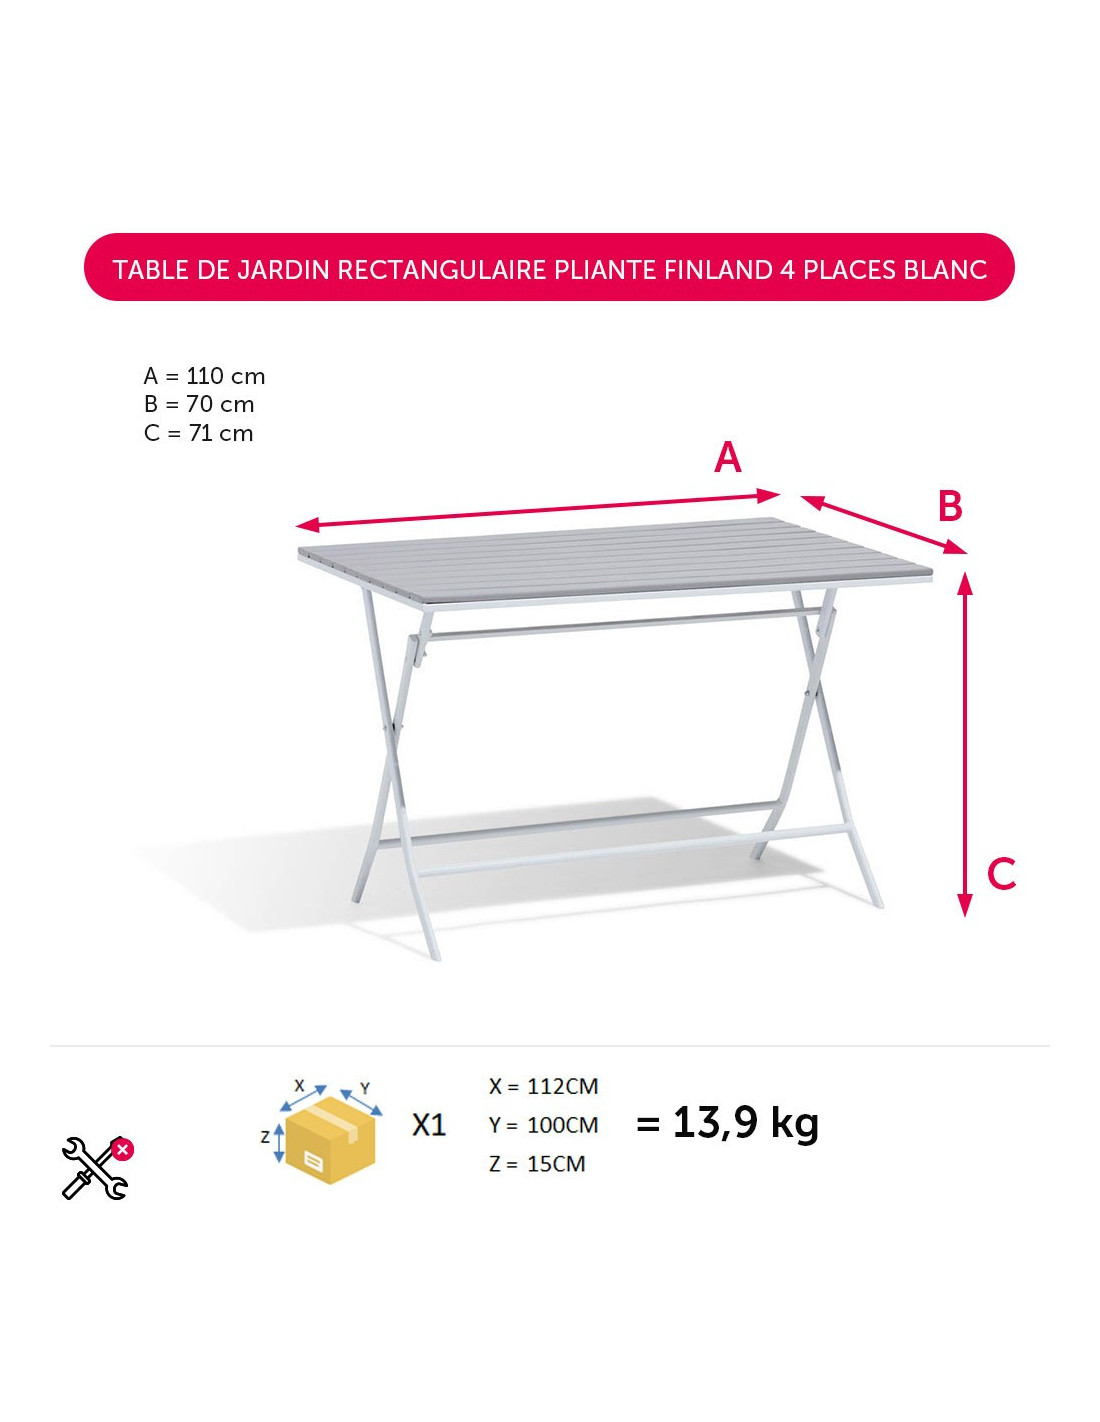 diffusion table de jardin rectangulaire